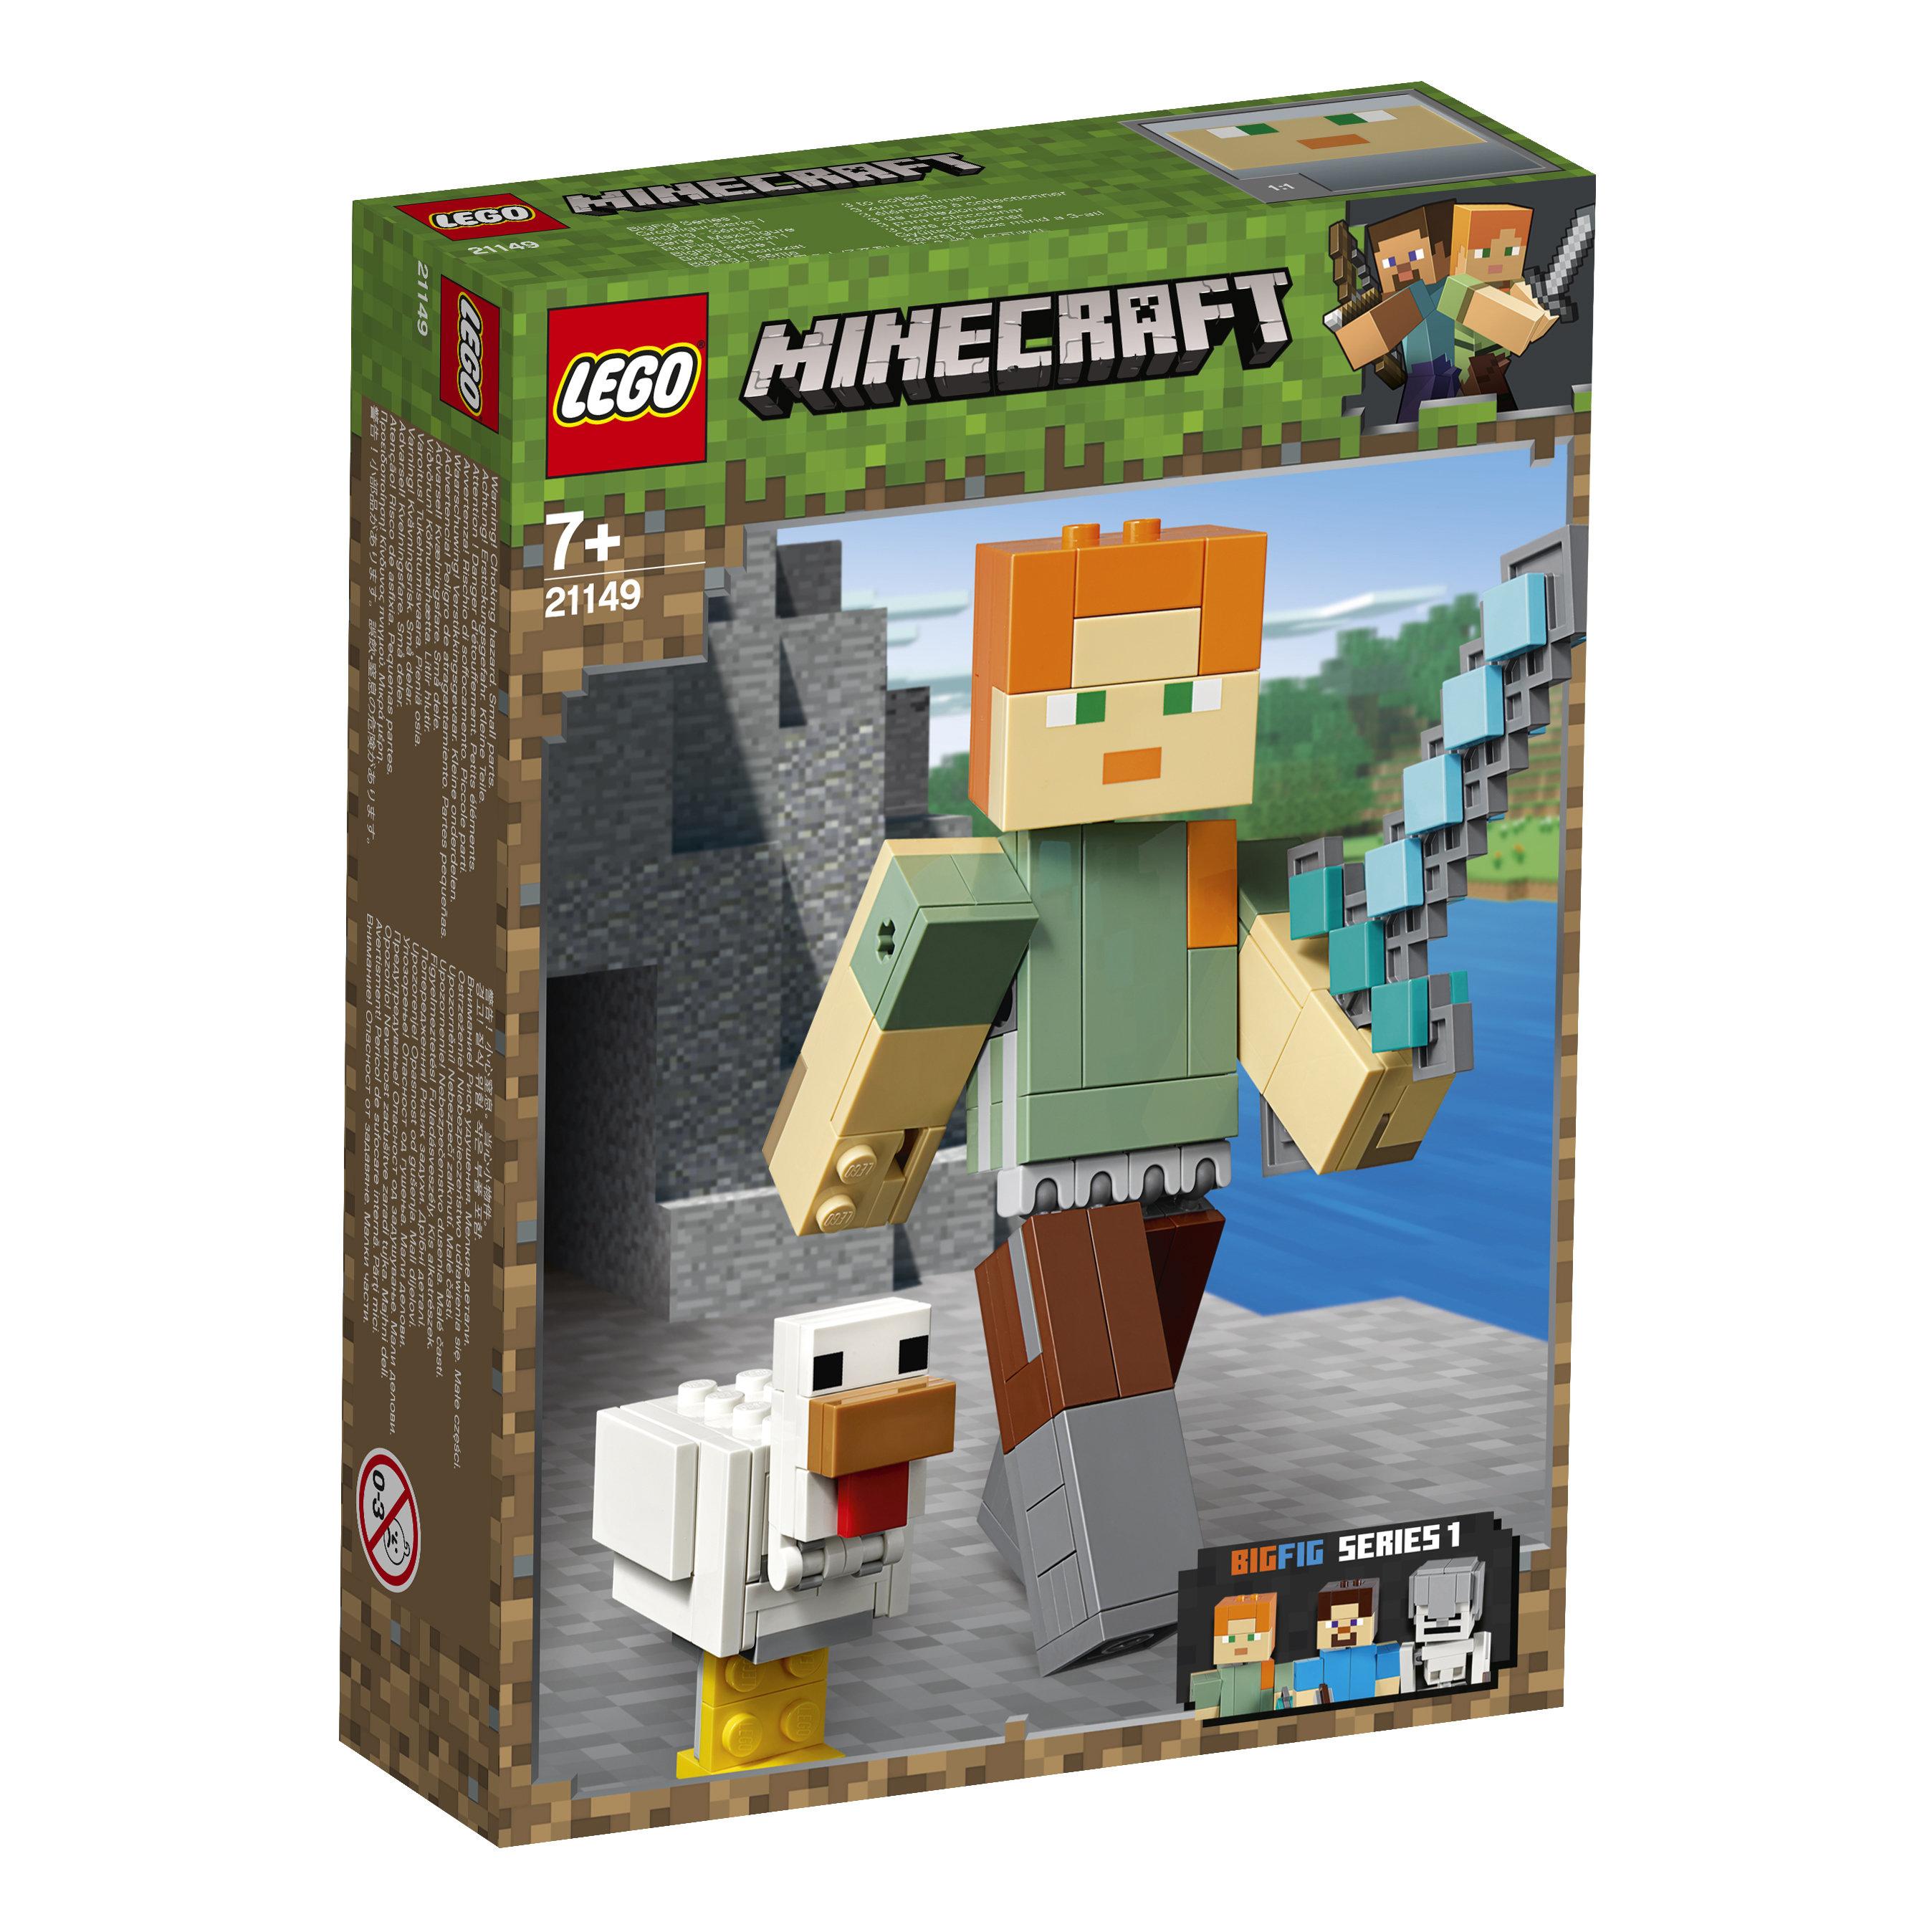 21149 LEGO® MINECRAFT BigFig Aleks su viščiuku